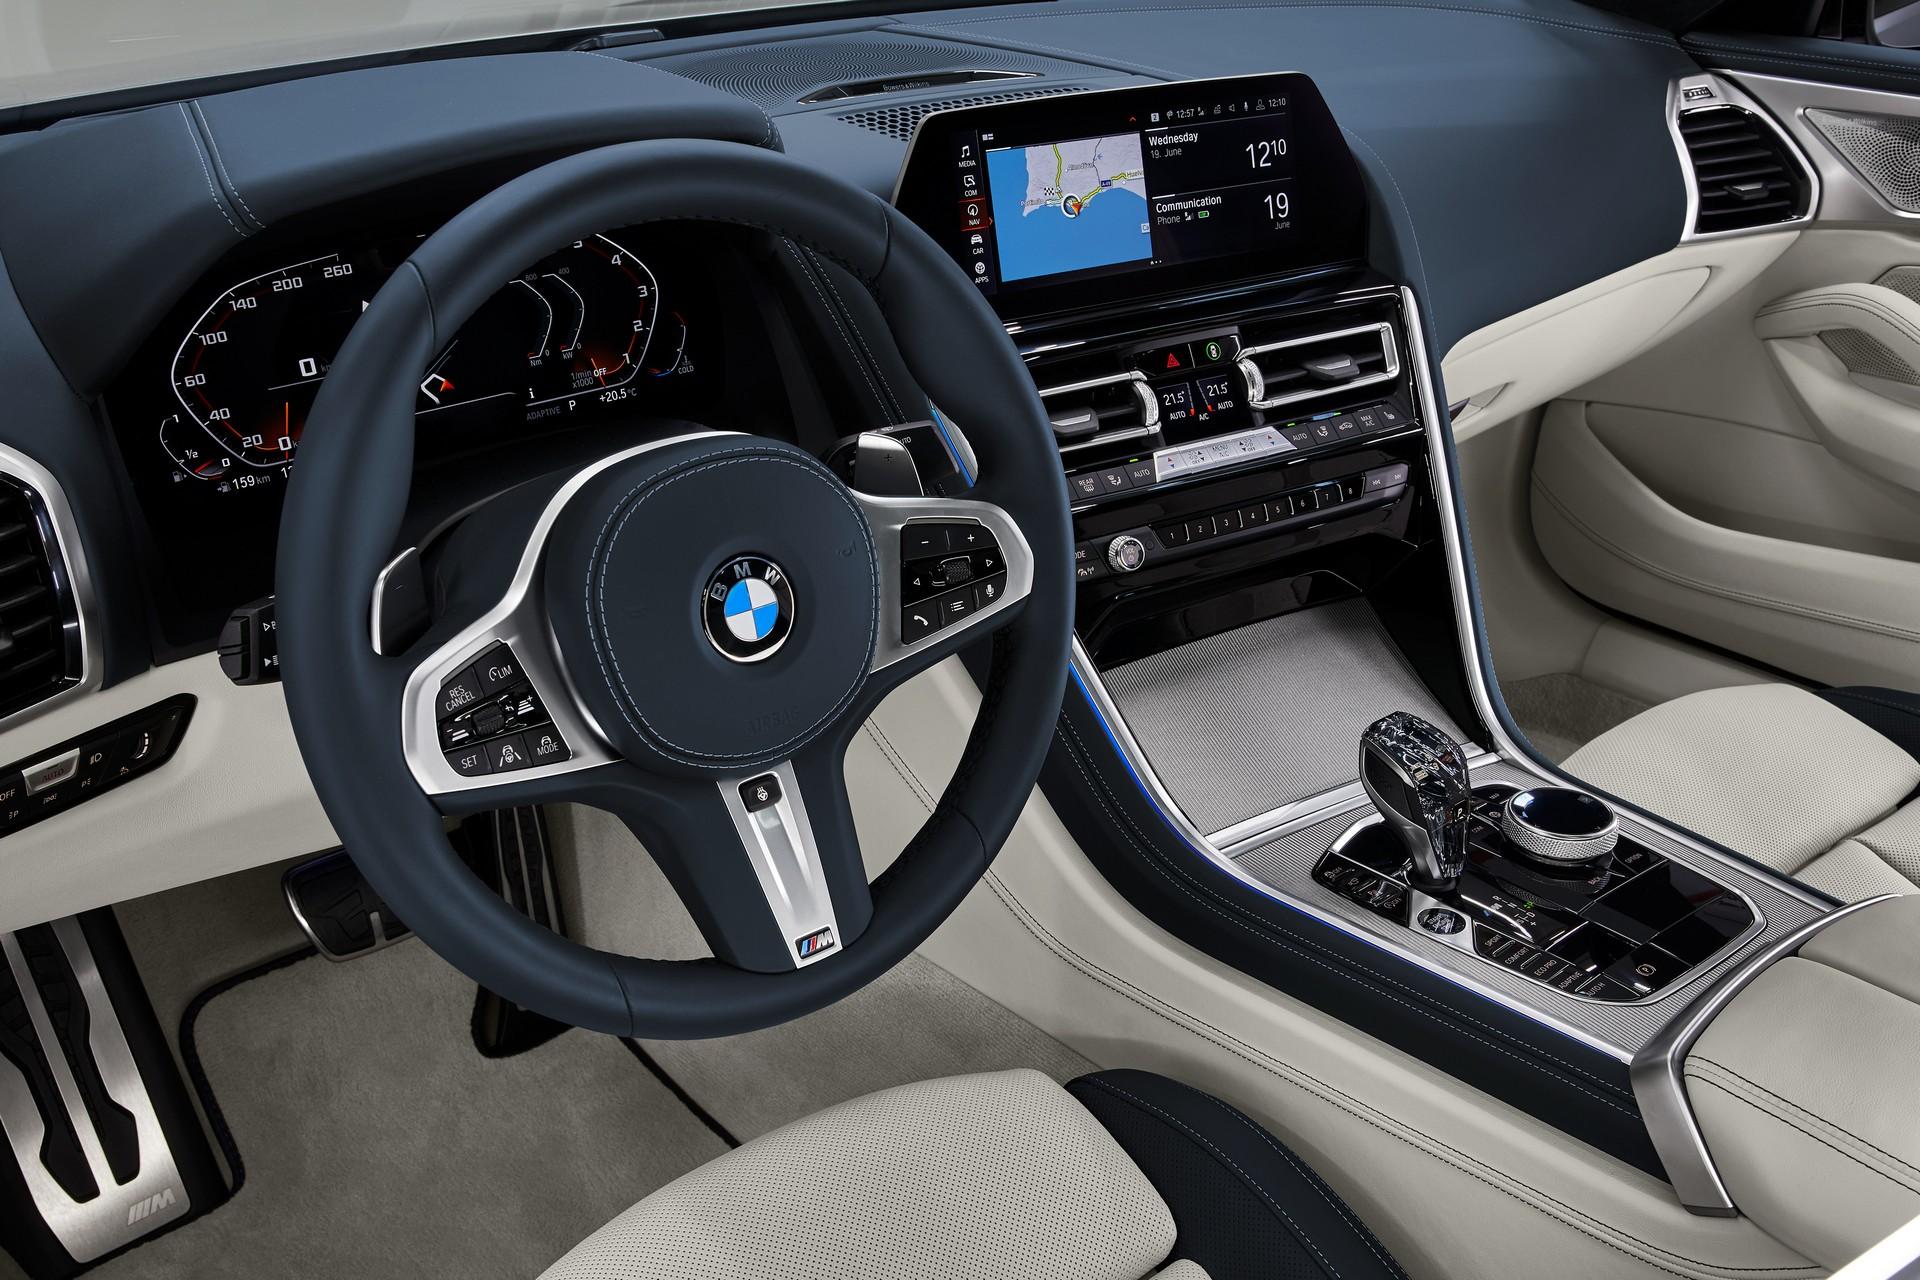 2020-bmw-8-series-gran-coupe-9.jpg